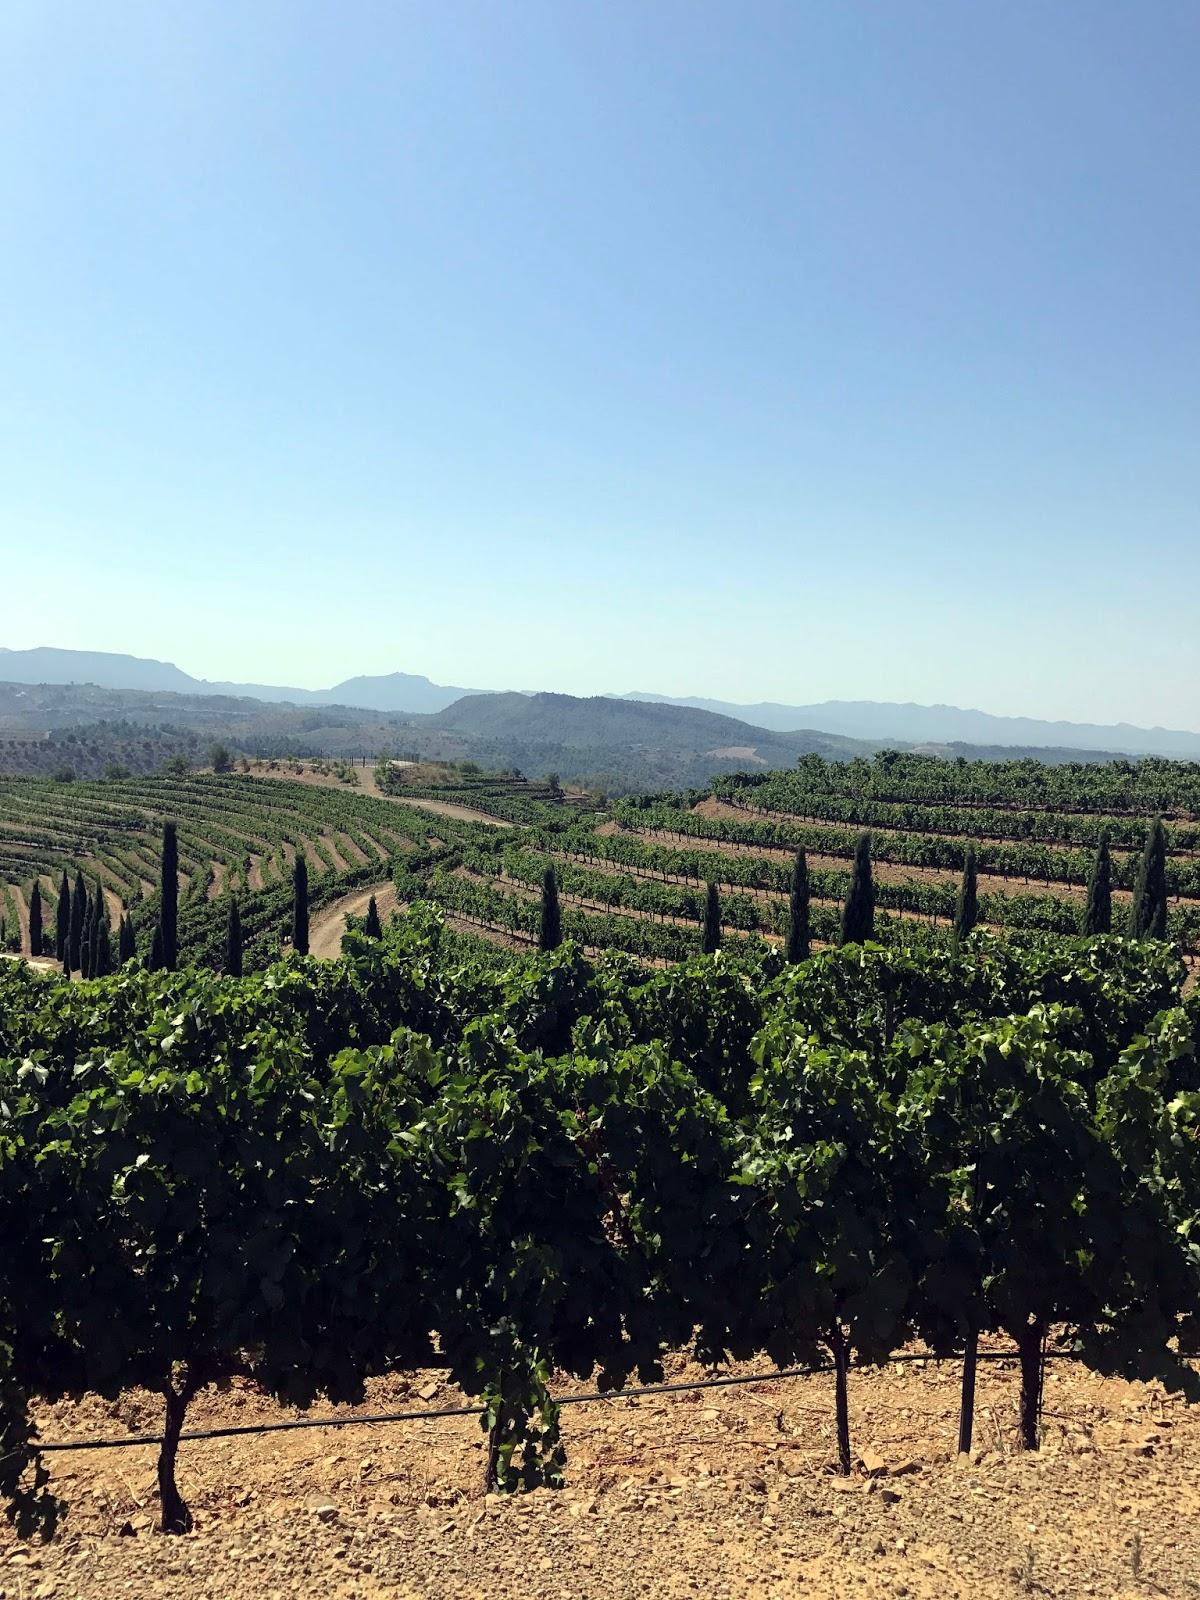 Stitch & Bear - The Priorat - Torres Priorat winery